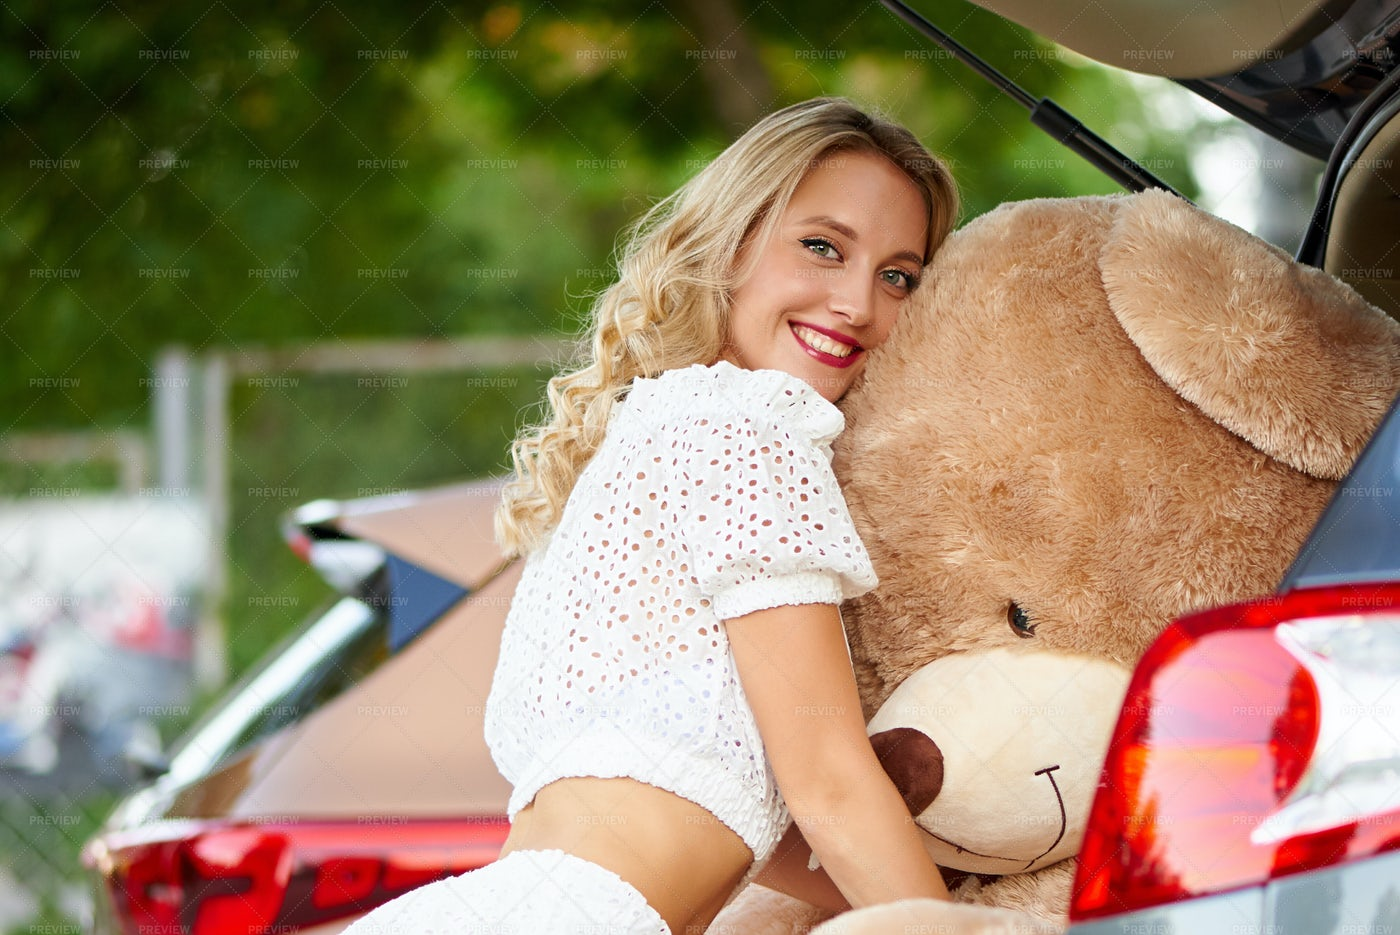 Hugging A Teddy Bear: Stock Photos